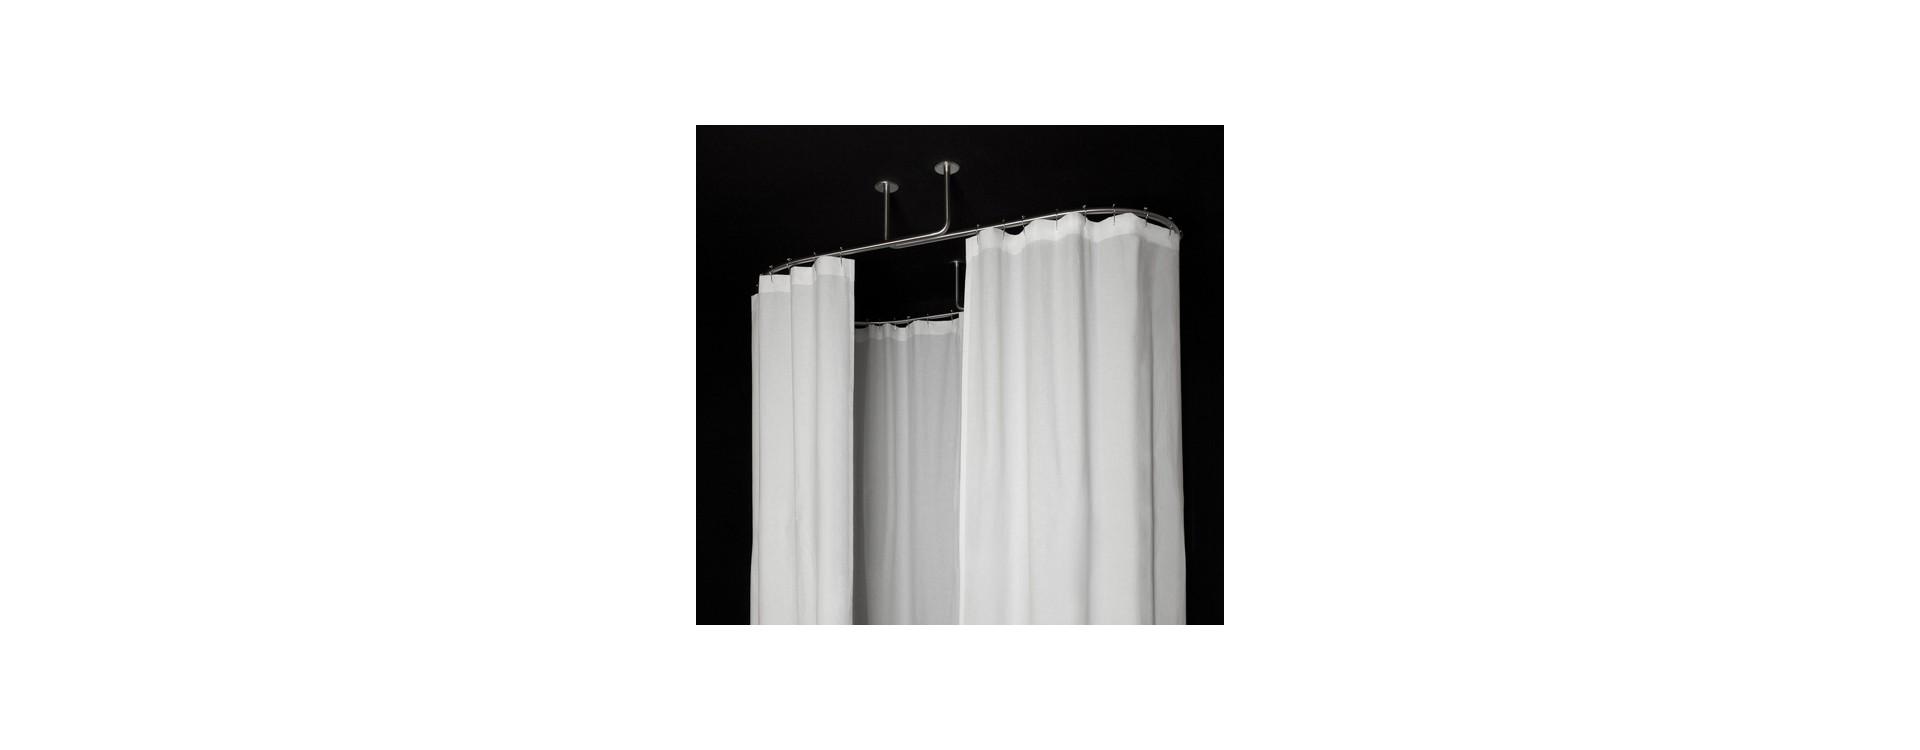 Barre Rideau Fixation Plafond dispositif de tringles galbobain ovale pour baignoire ilot